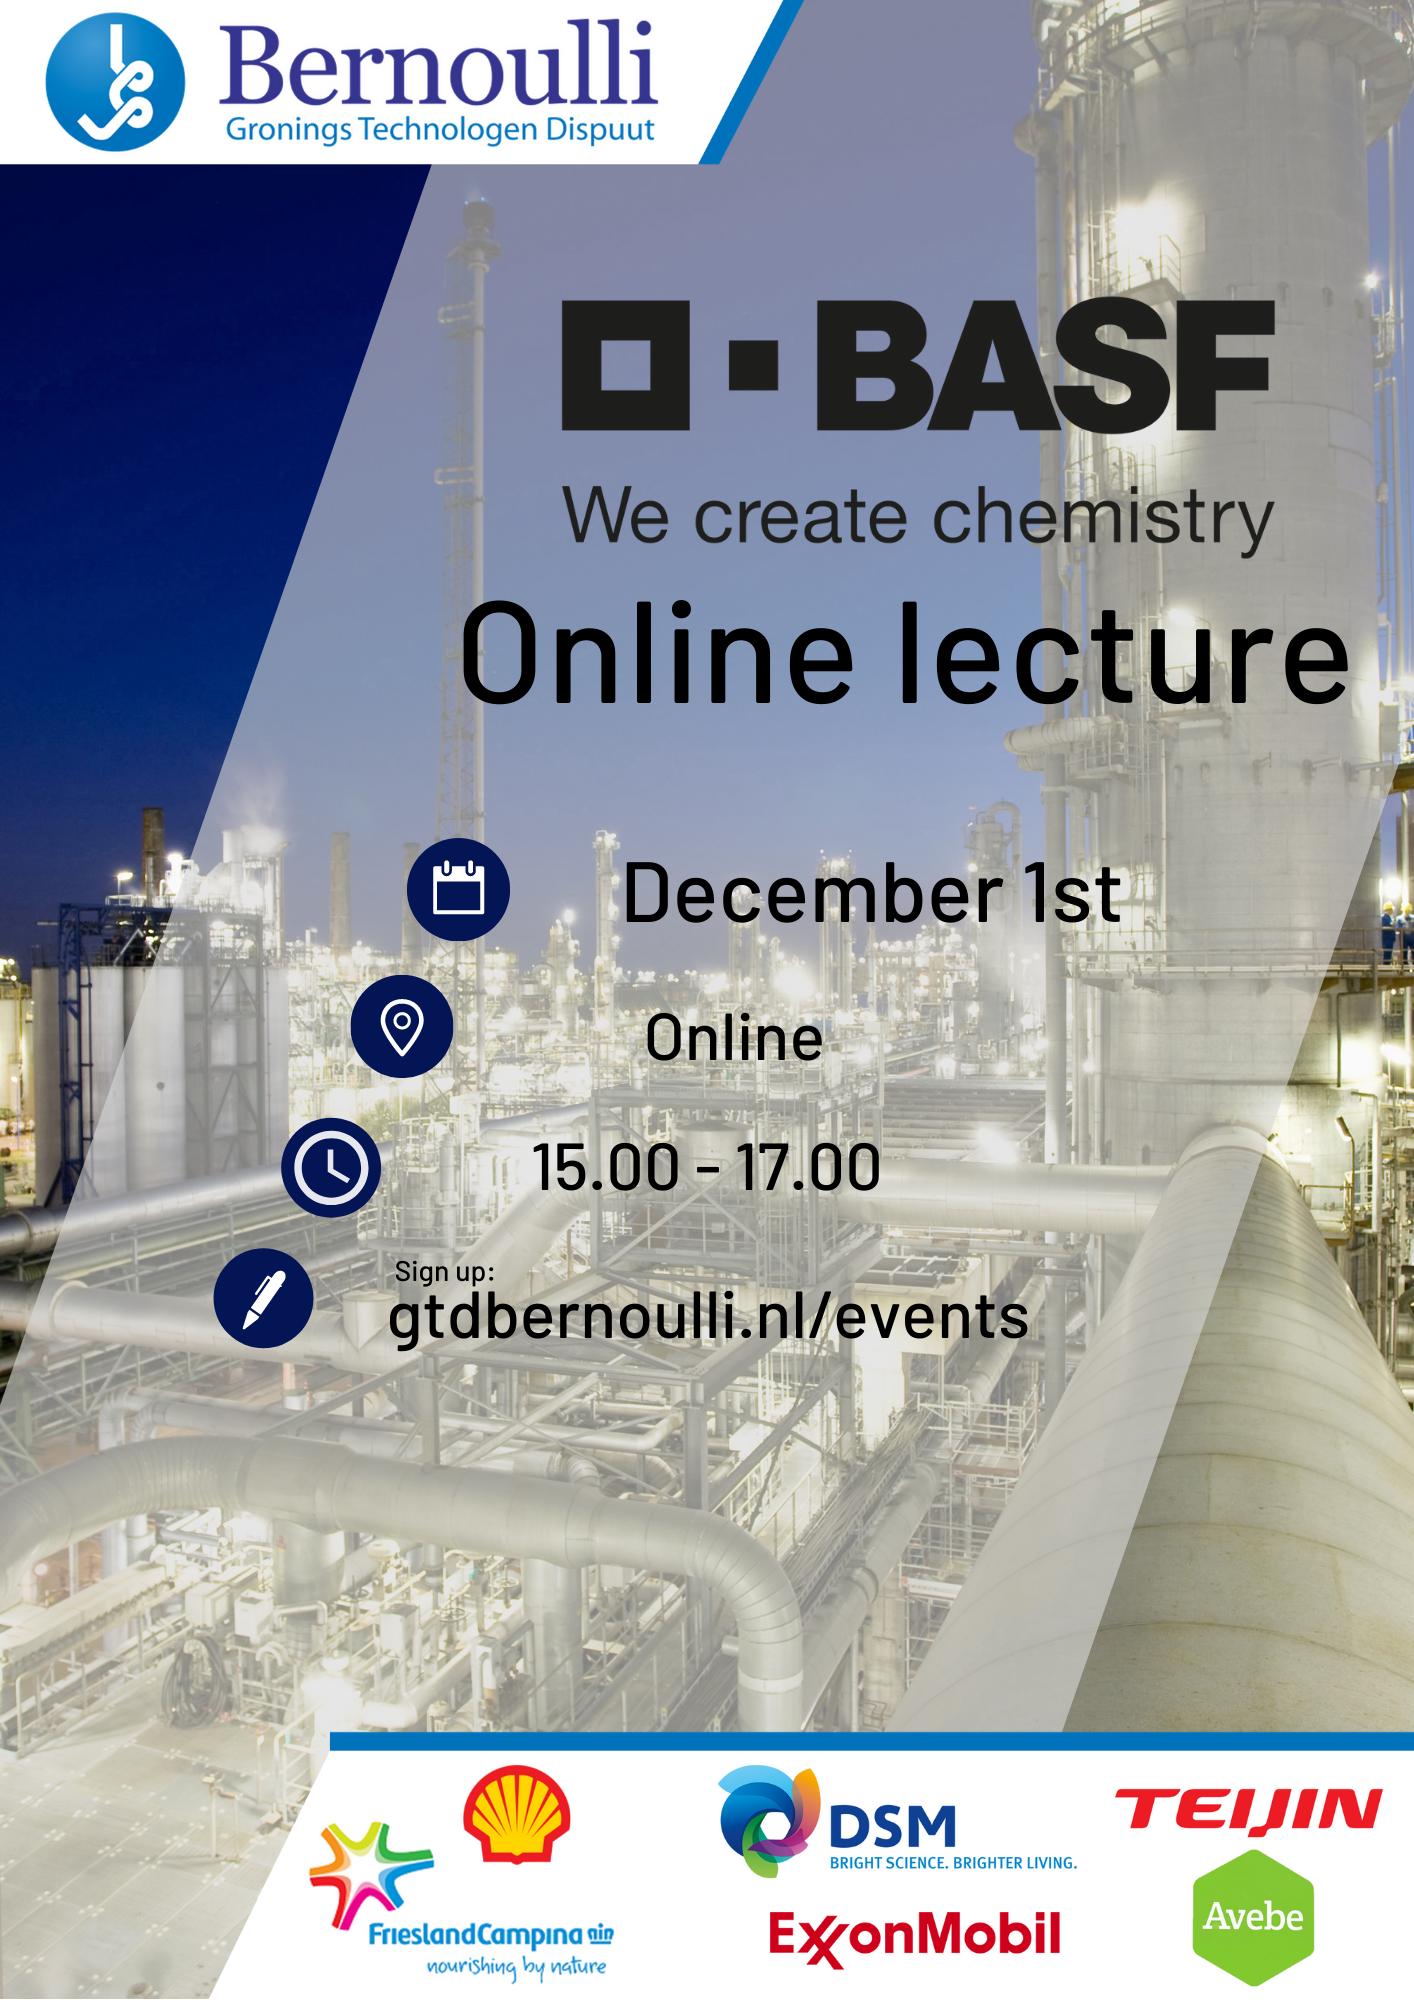 BASF Online Lecture